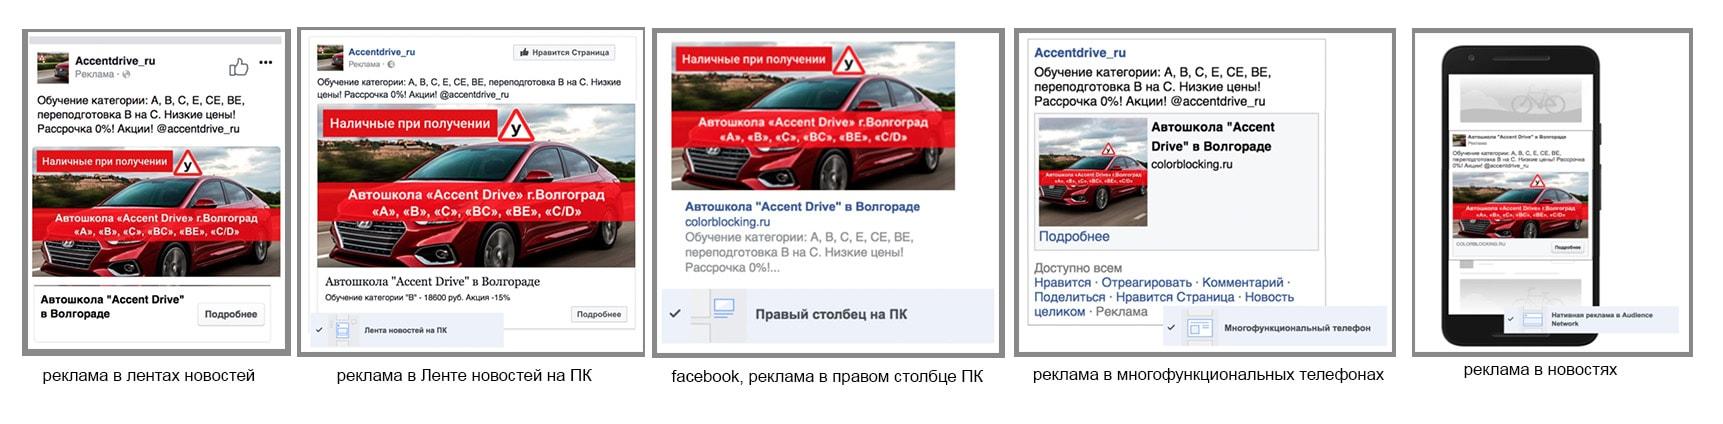 Рекламная кампания Accent Drive реклама